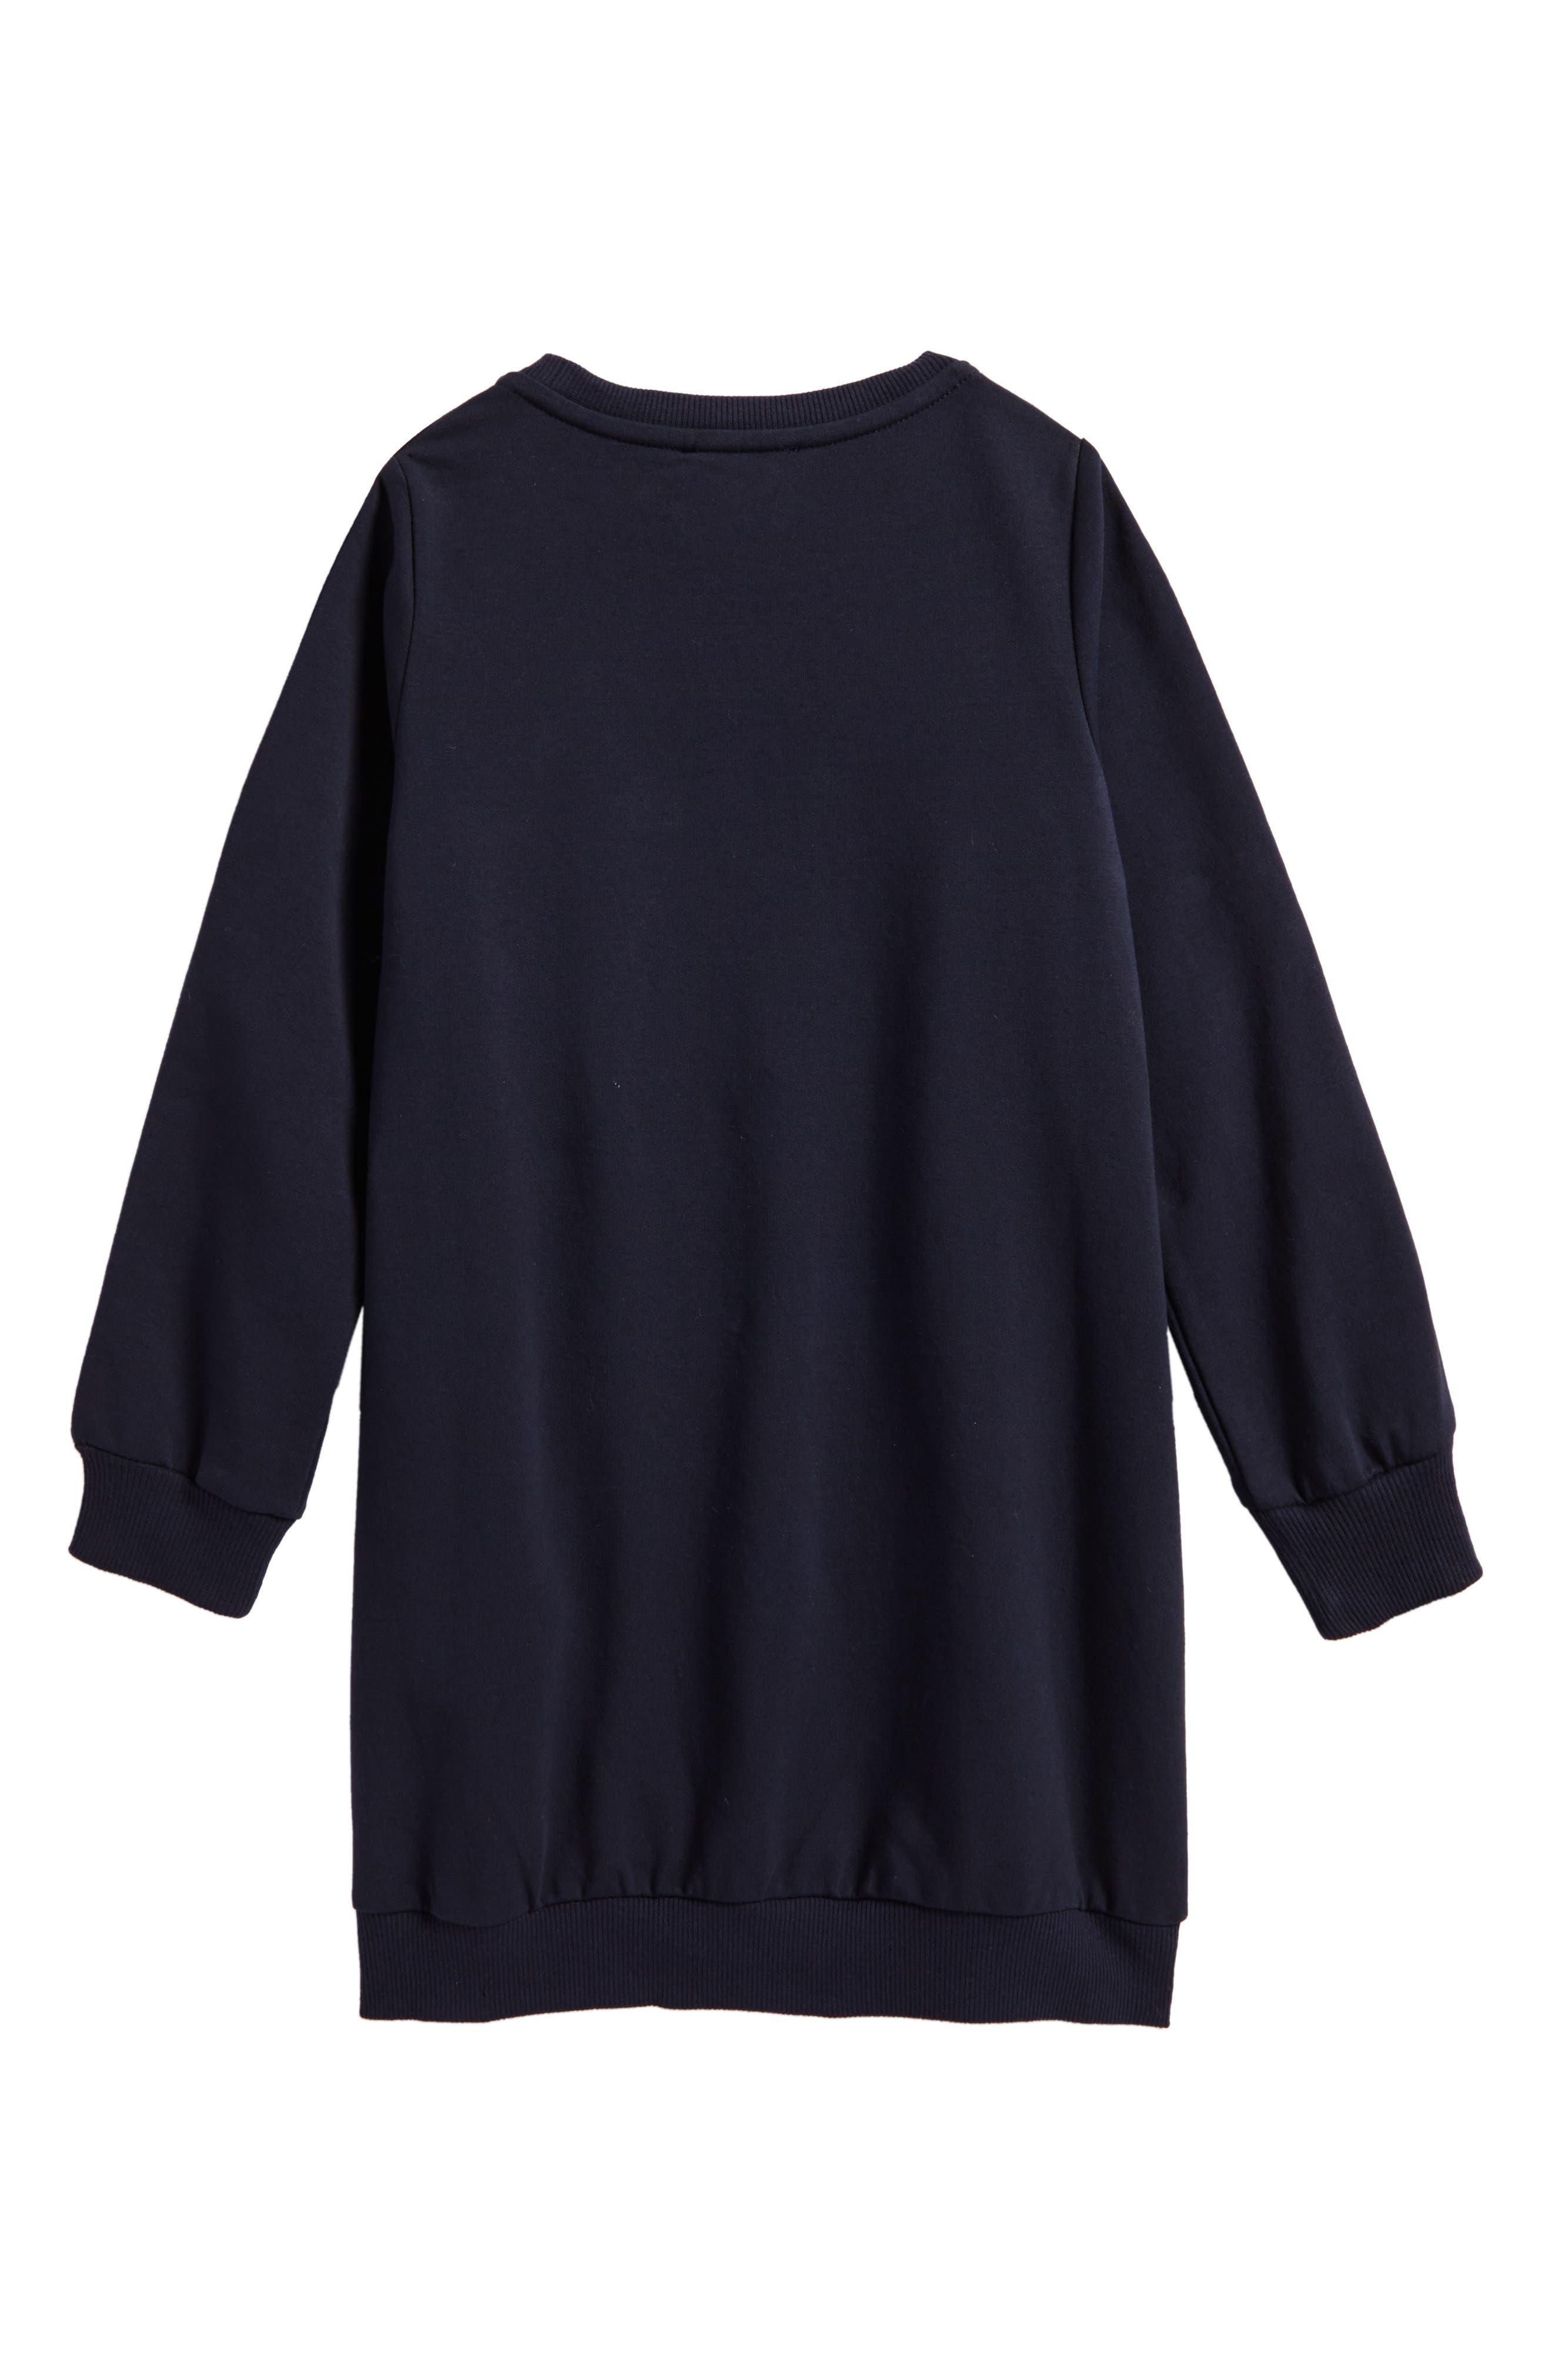 Alternate Image 2  - Moncler Sweatshirt Dress (Little Girls & Big Girls)